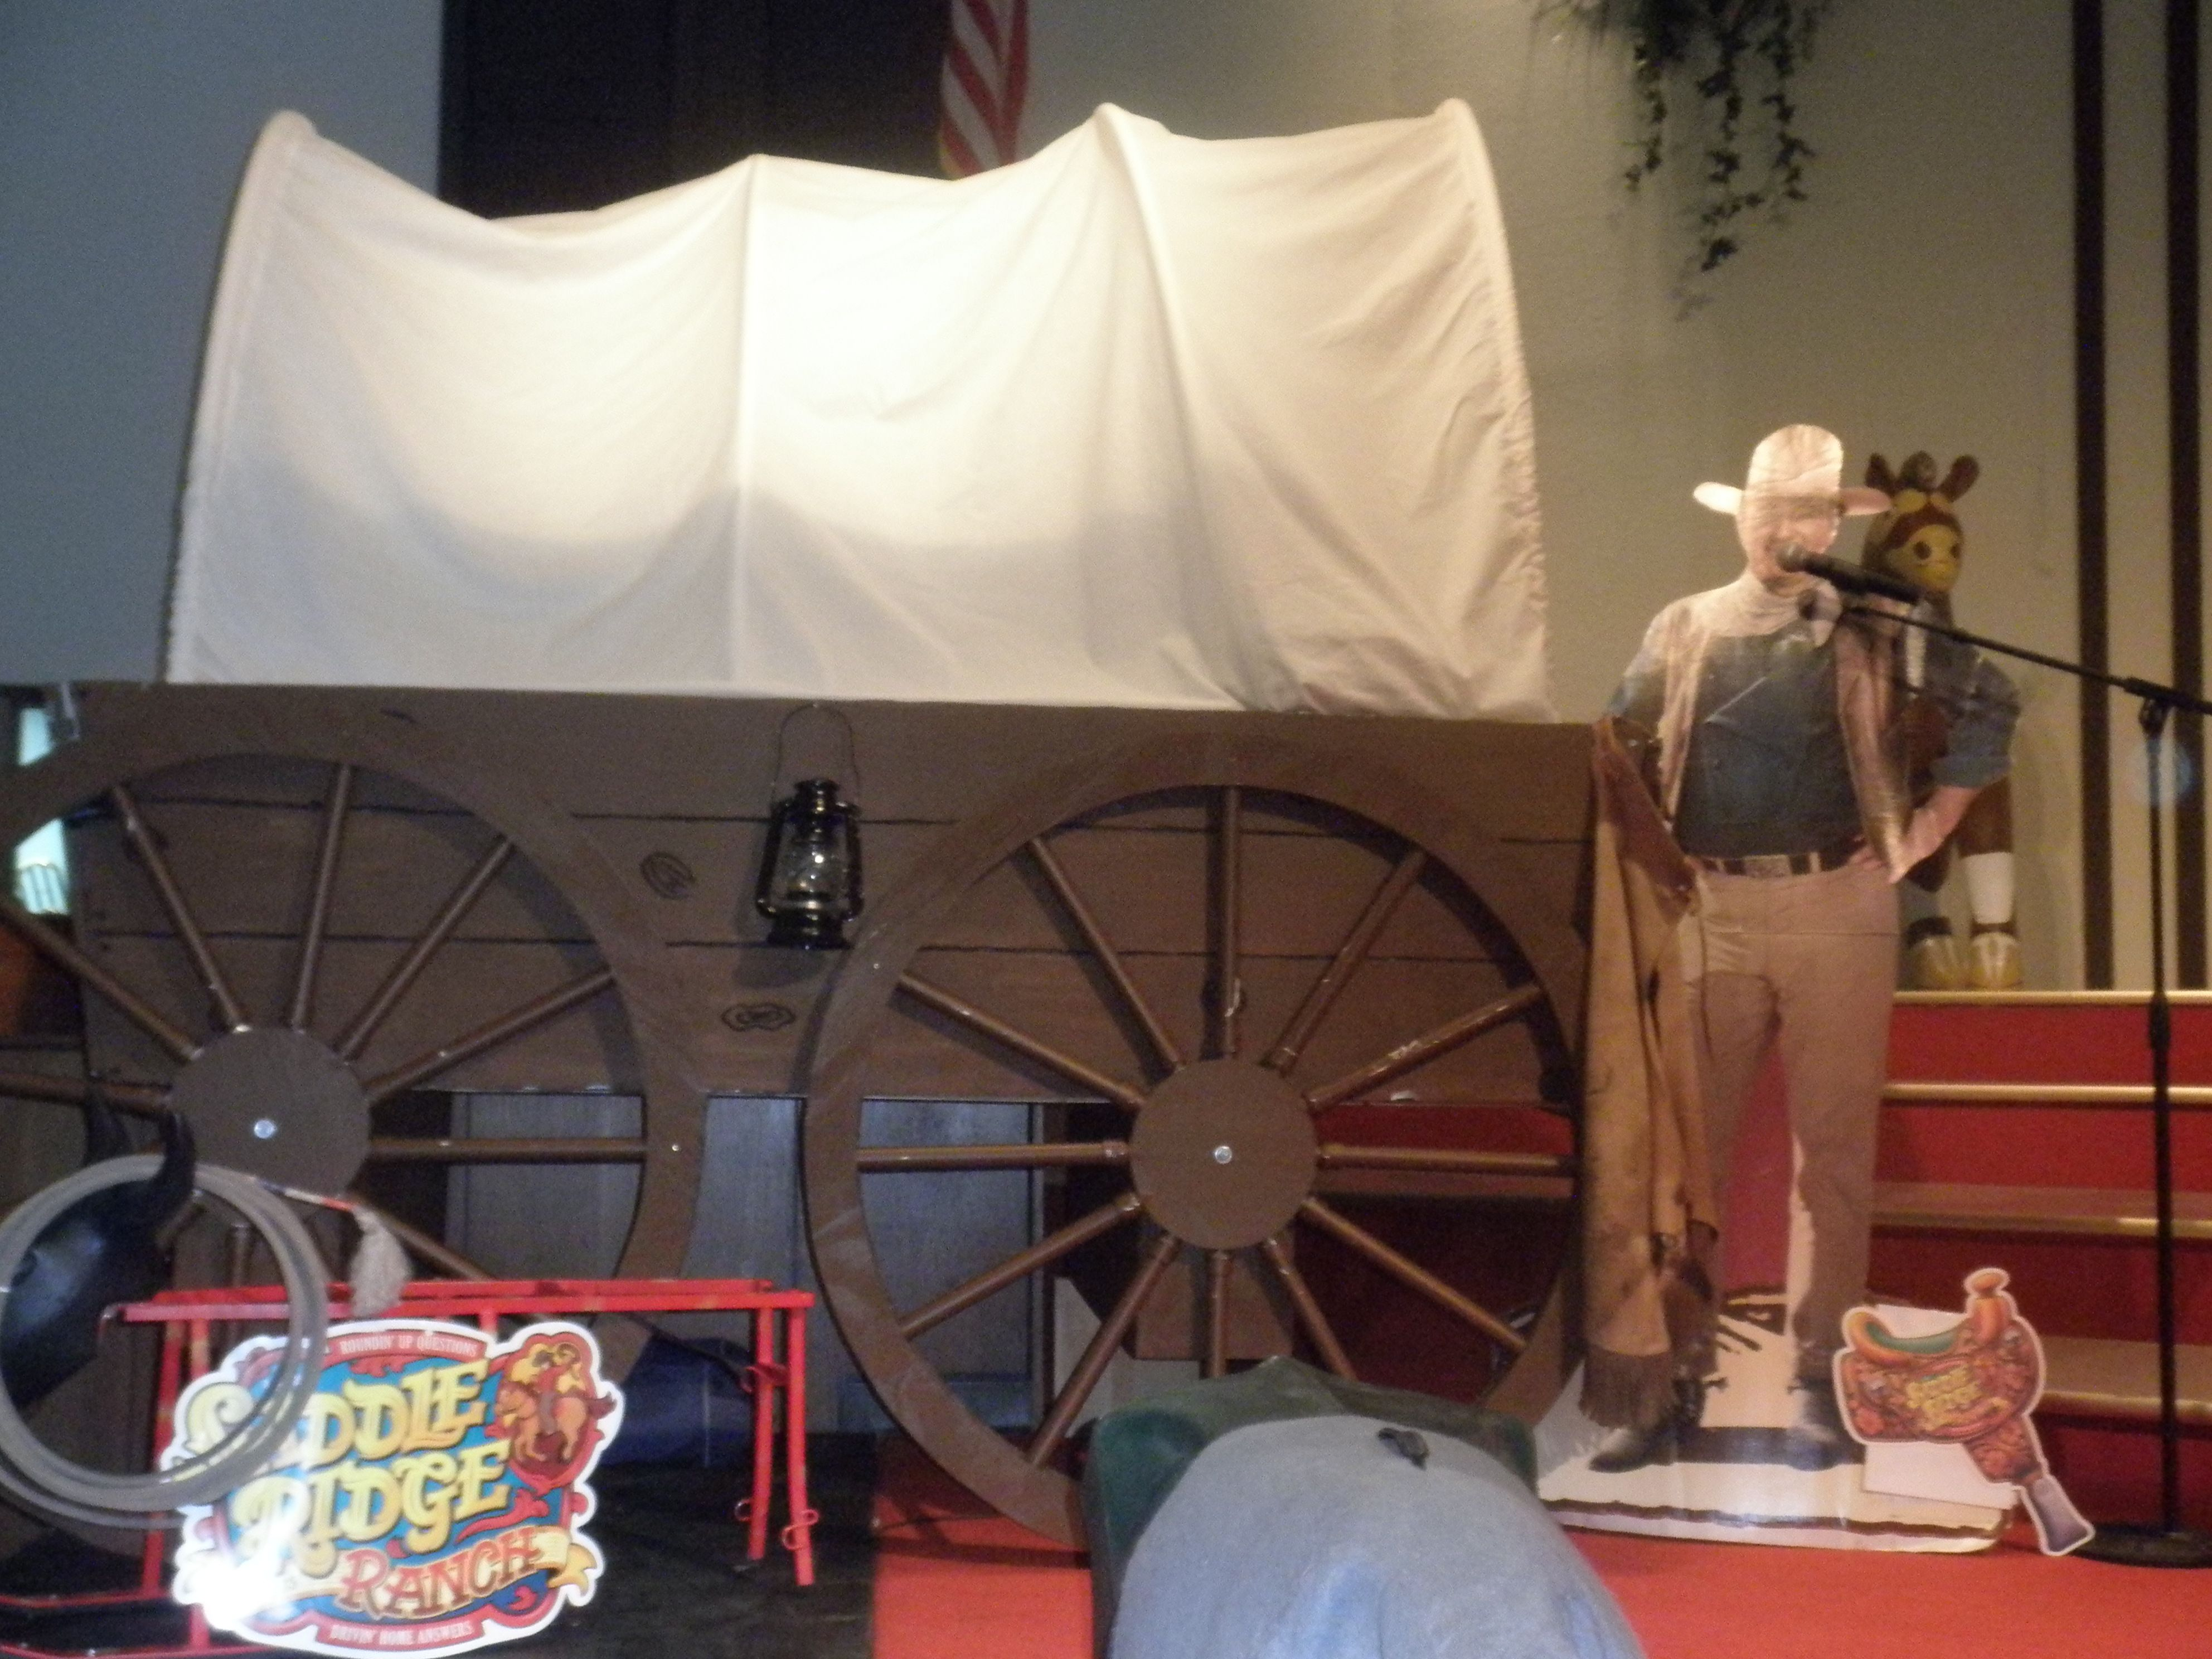 Saddle Ridge Ranch Decorations. VBS 2010 | VBS Western ...